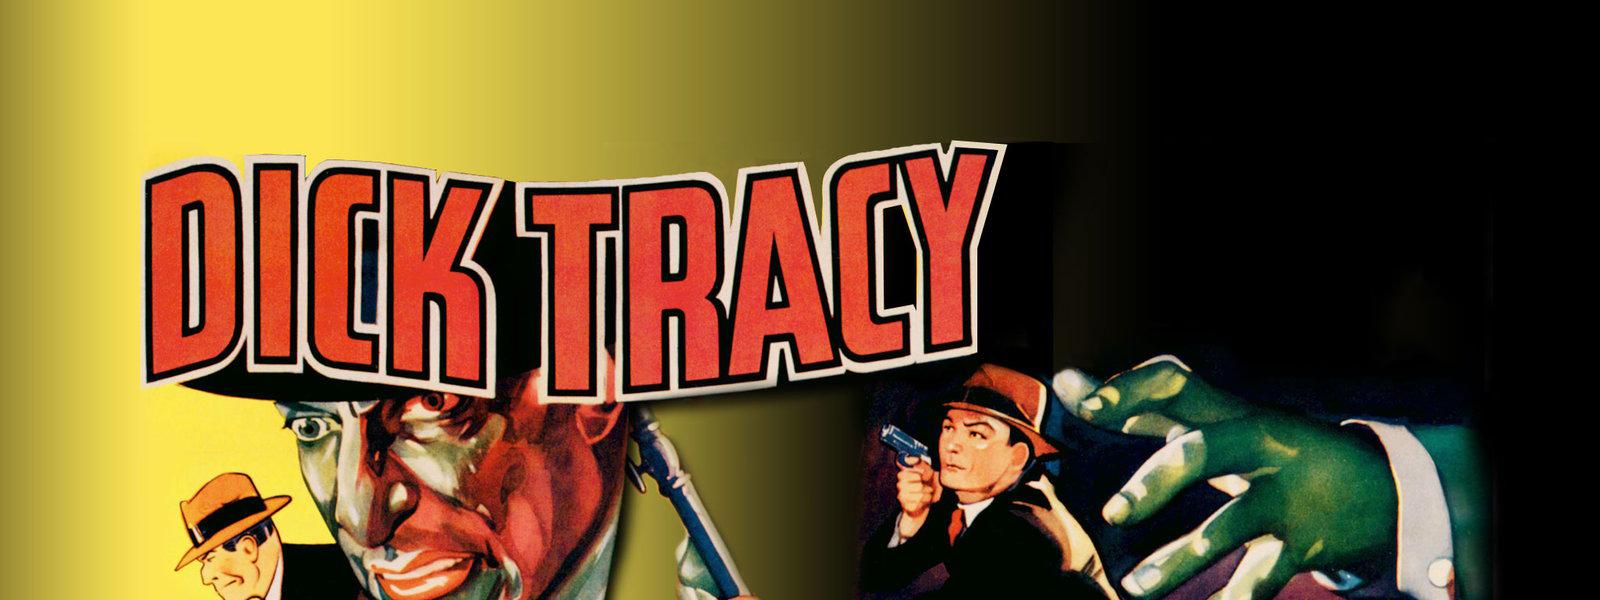 Dick Tracy [TV Series]